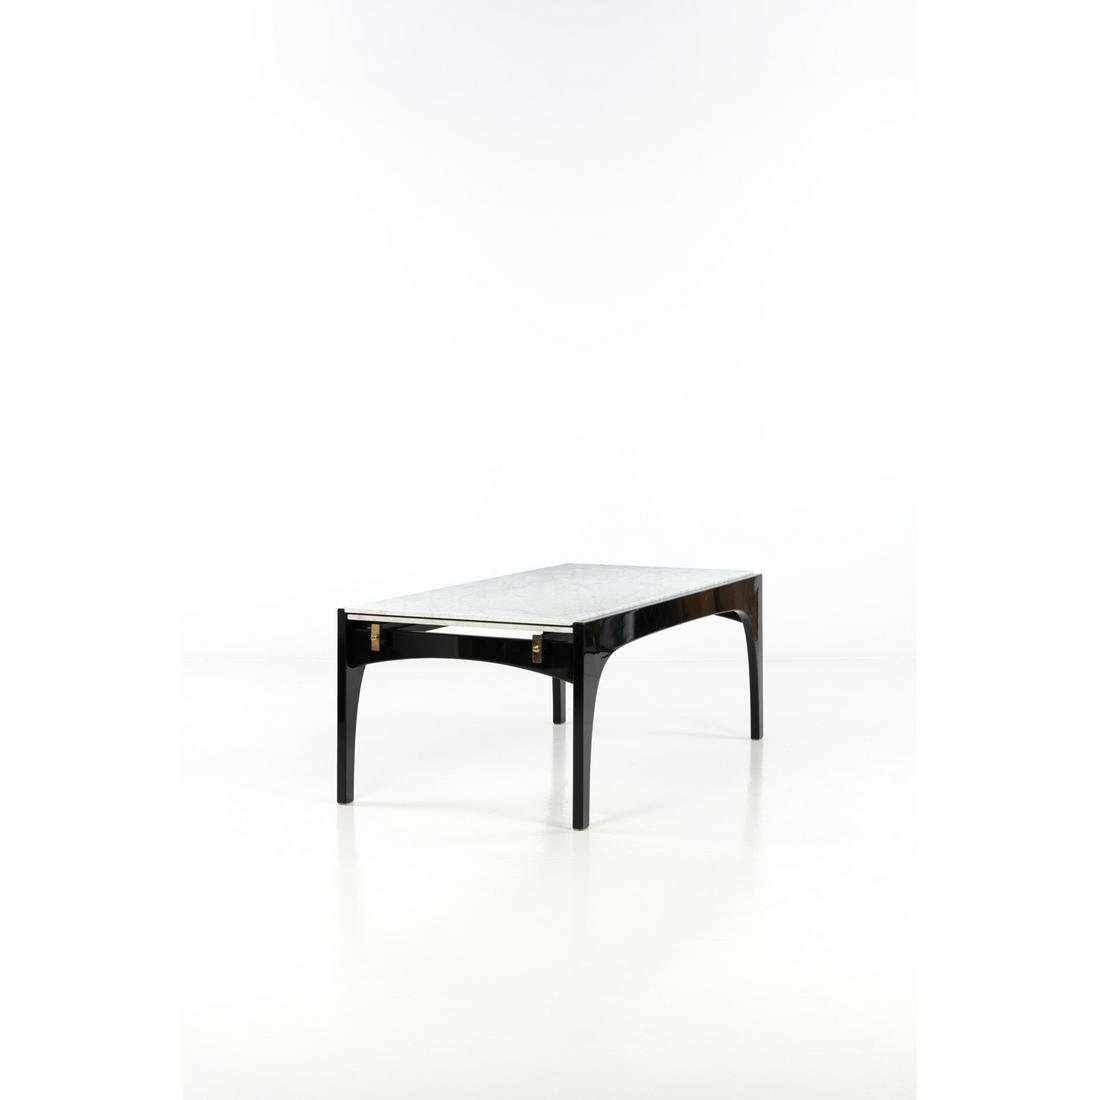 Ignazio Gardella (1905-1999) Partenio Table with